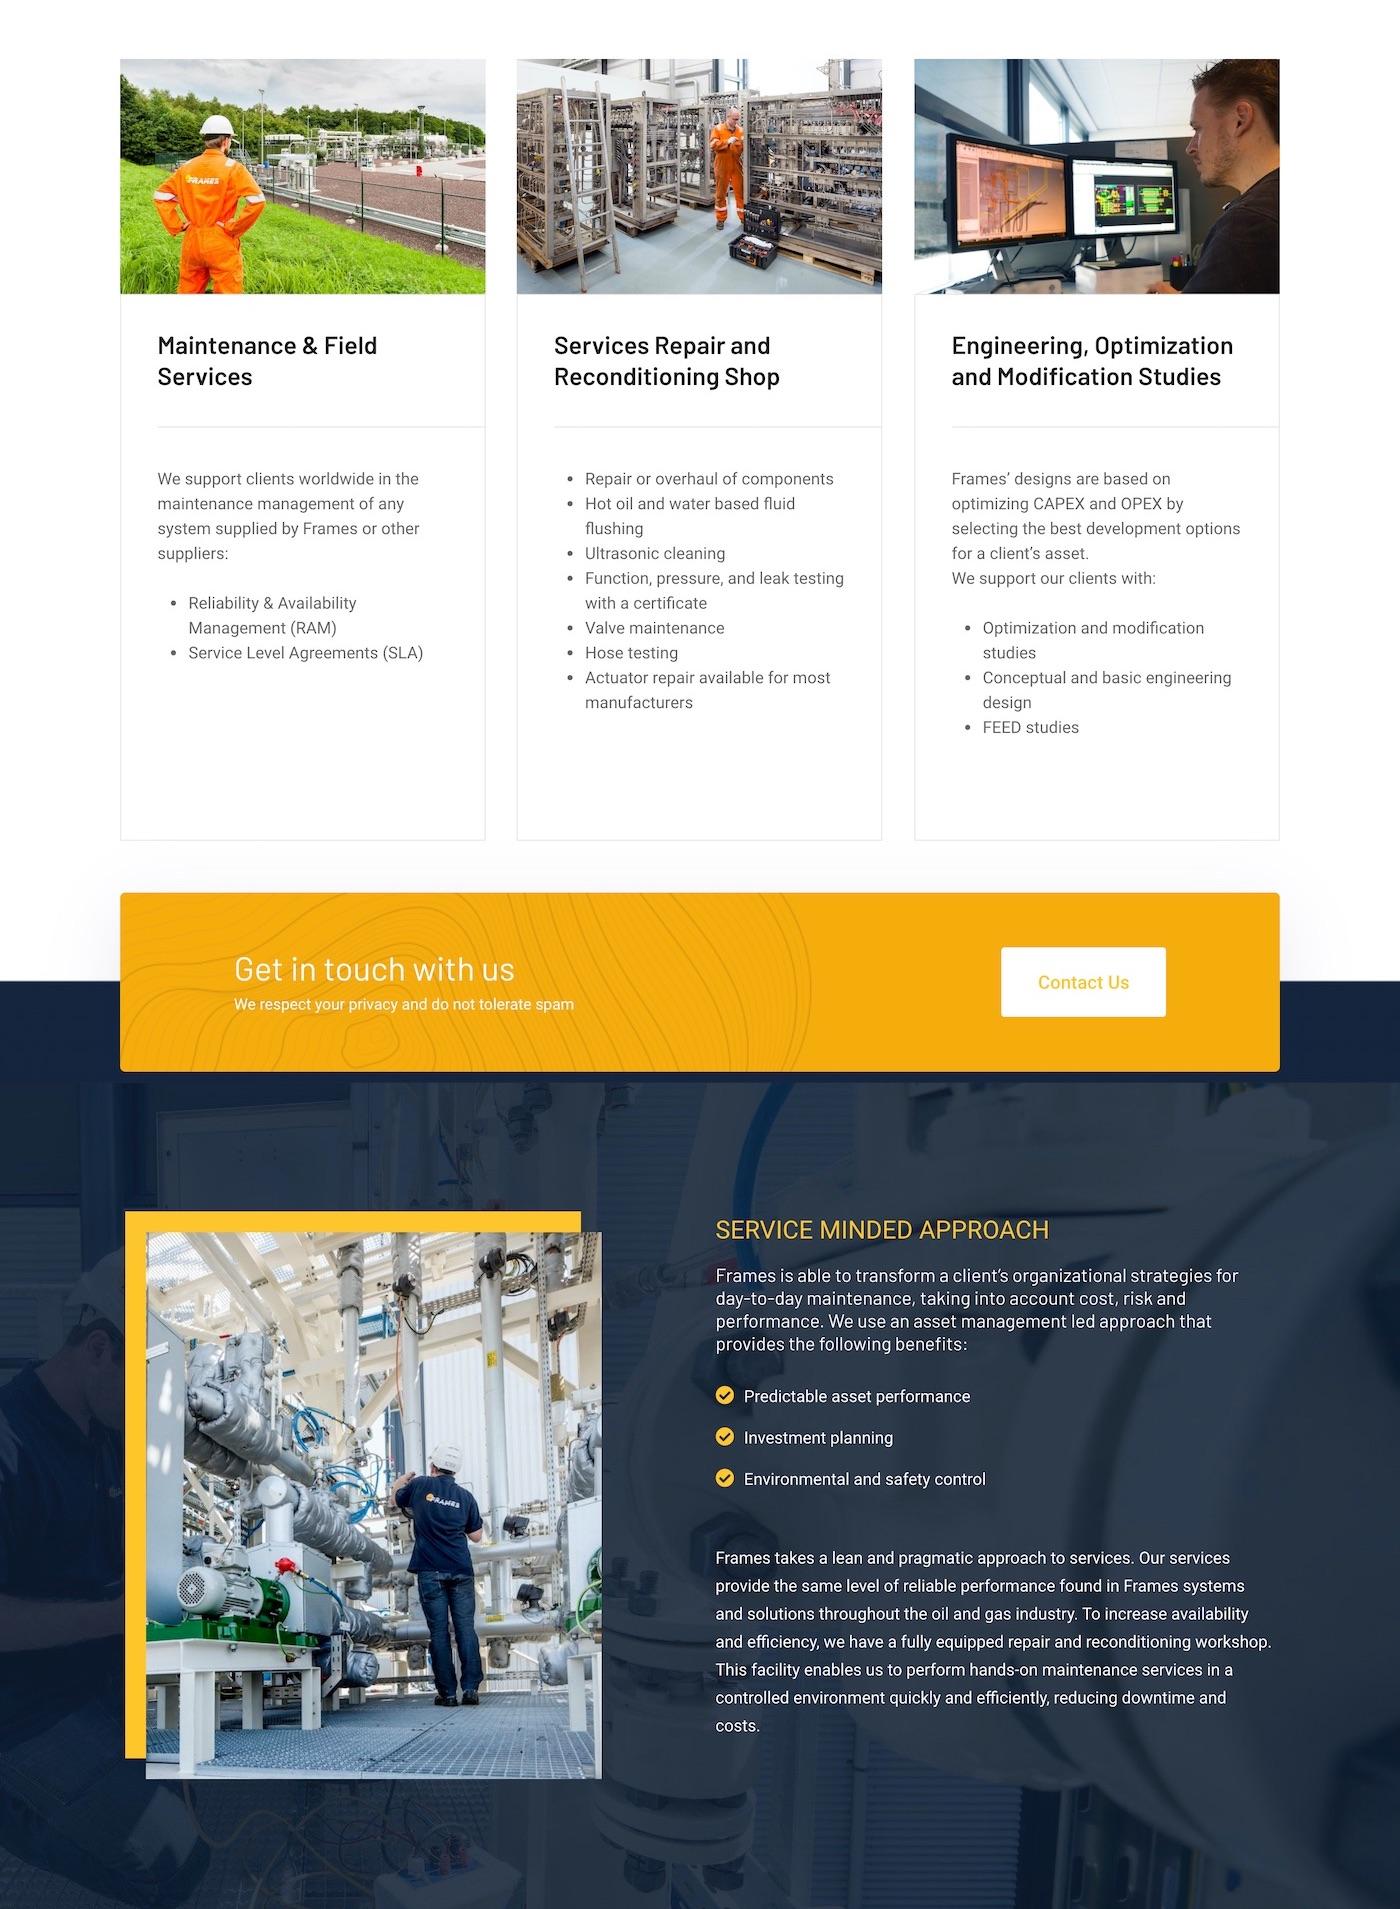 frames-group.com-corporate-wordpress-website-development-work-in-netherland-europe-services-1